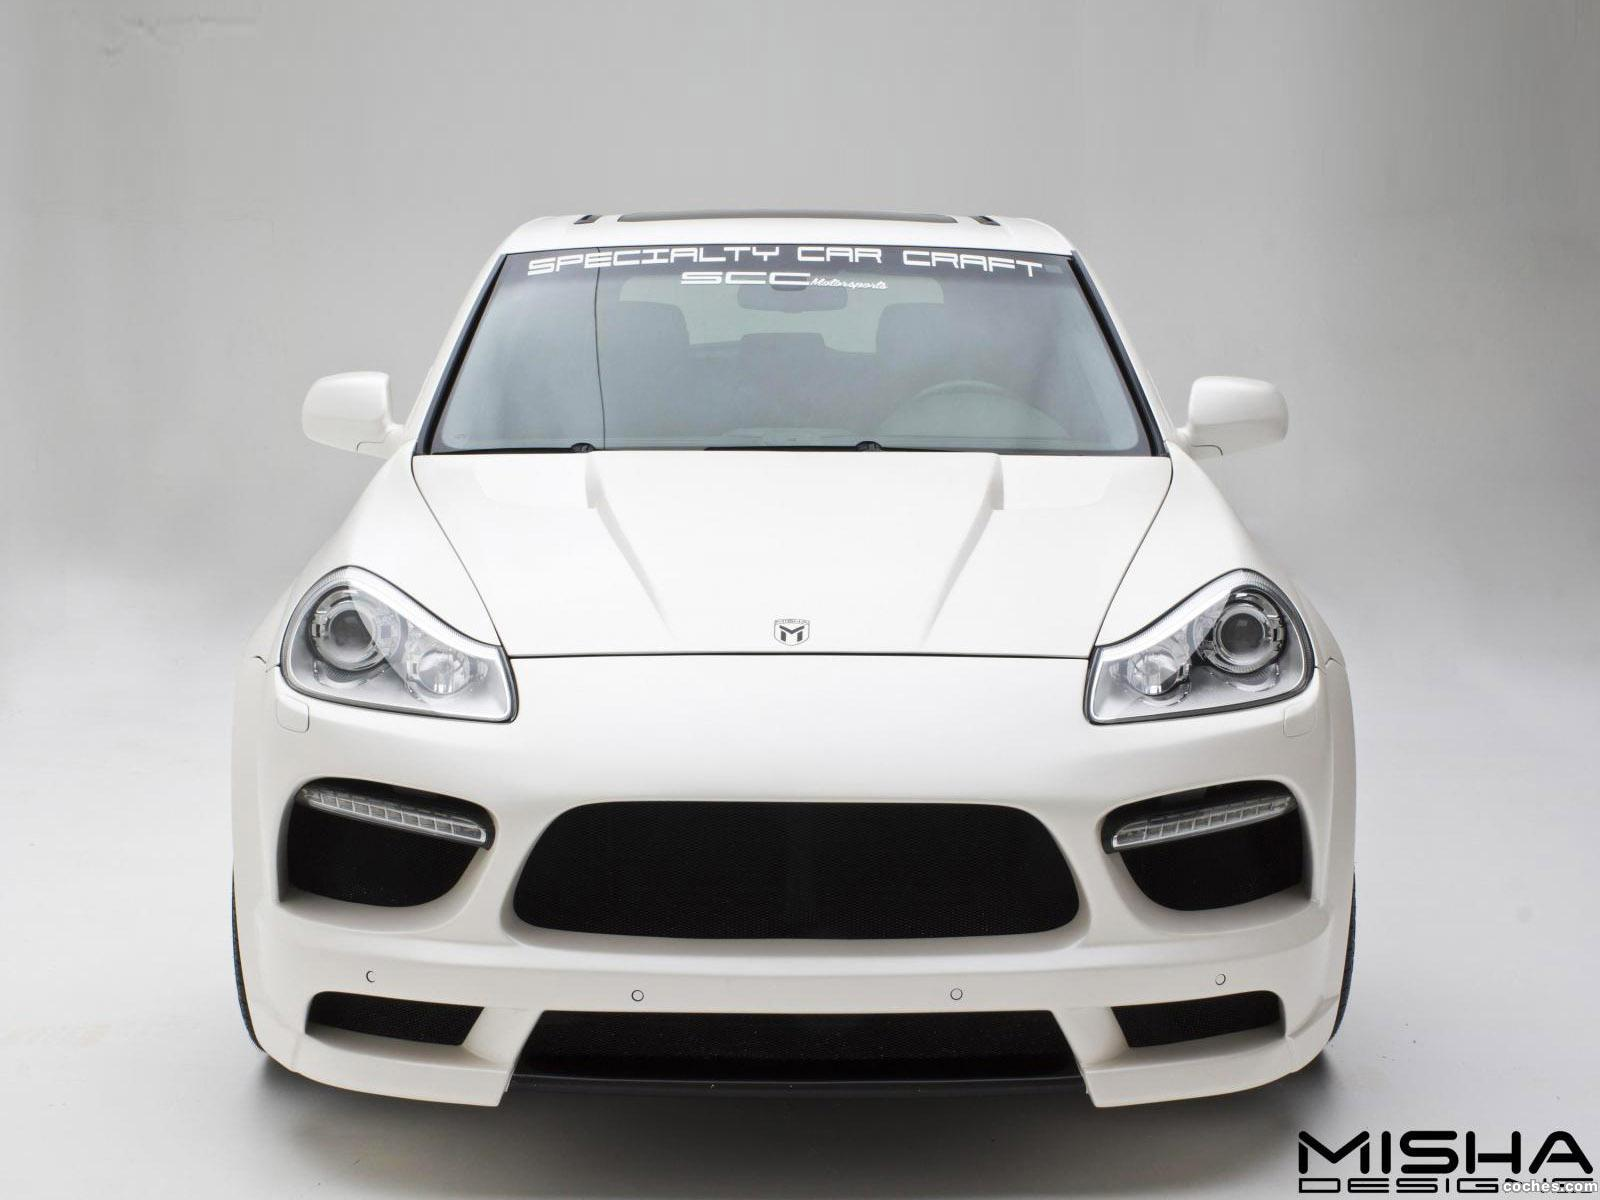 Foto 6 de Misha Porsche Cayenne Wide Body 2013